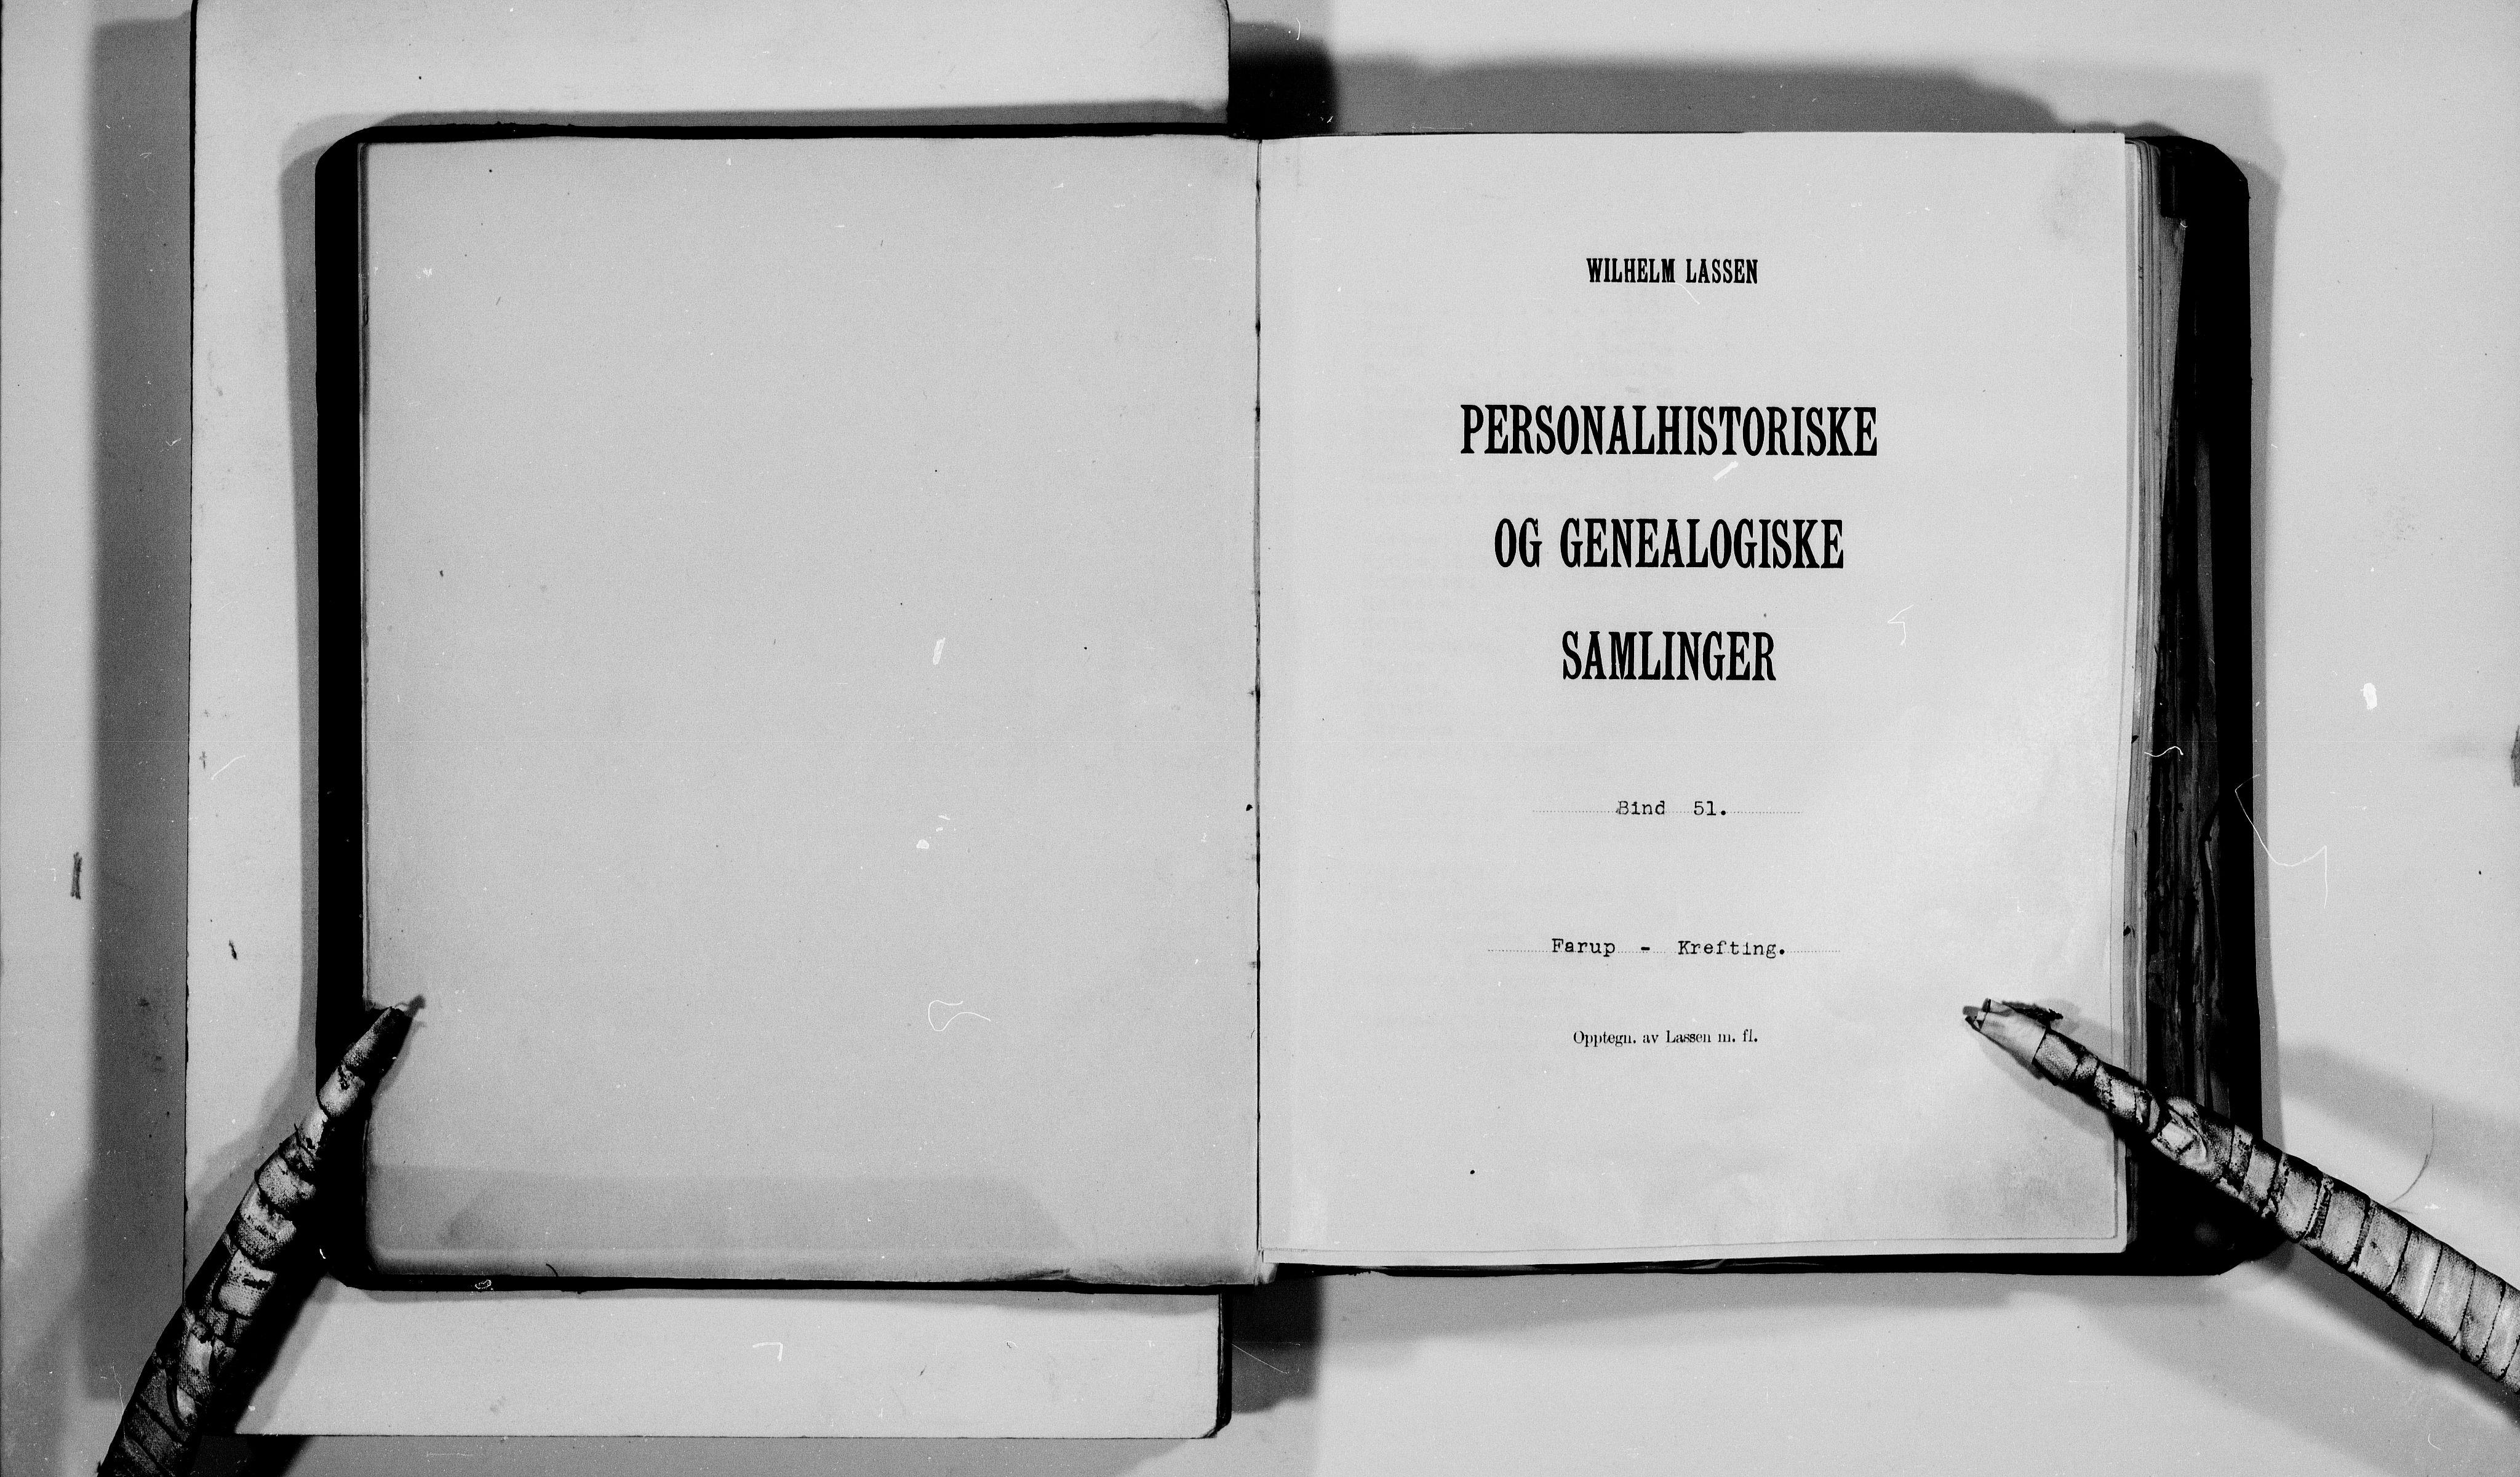 RA, Lassens samlinger, F/Fb, s. upaginert